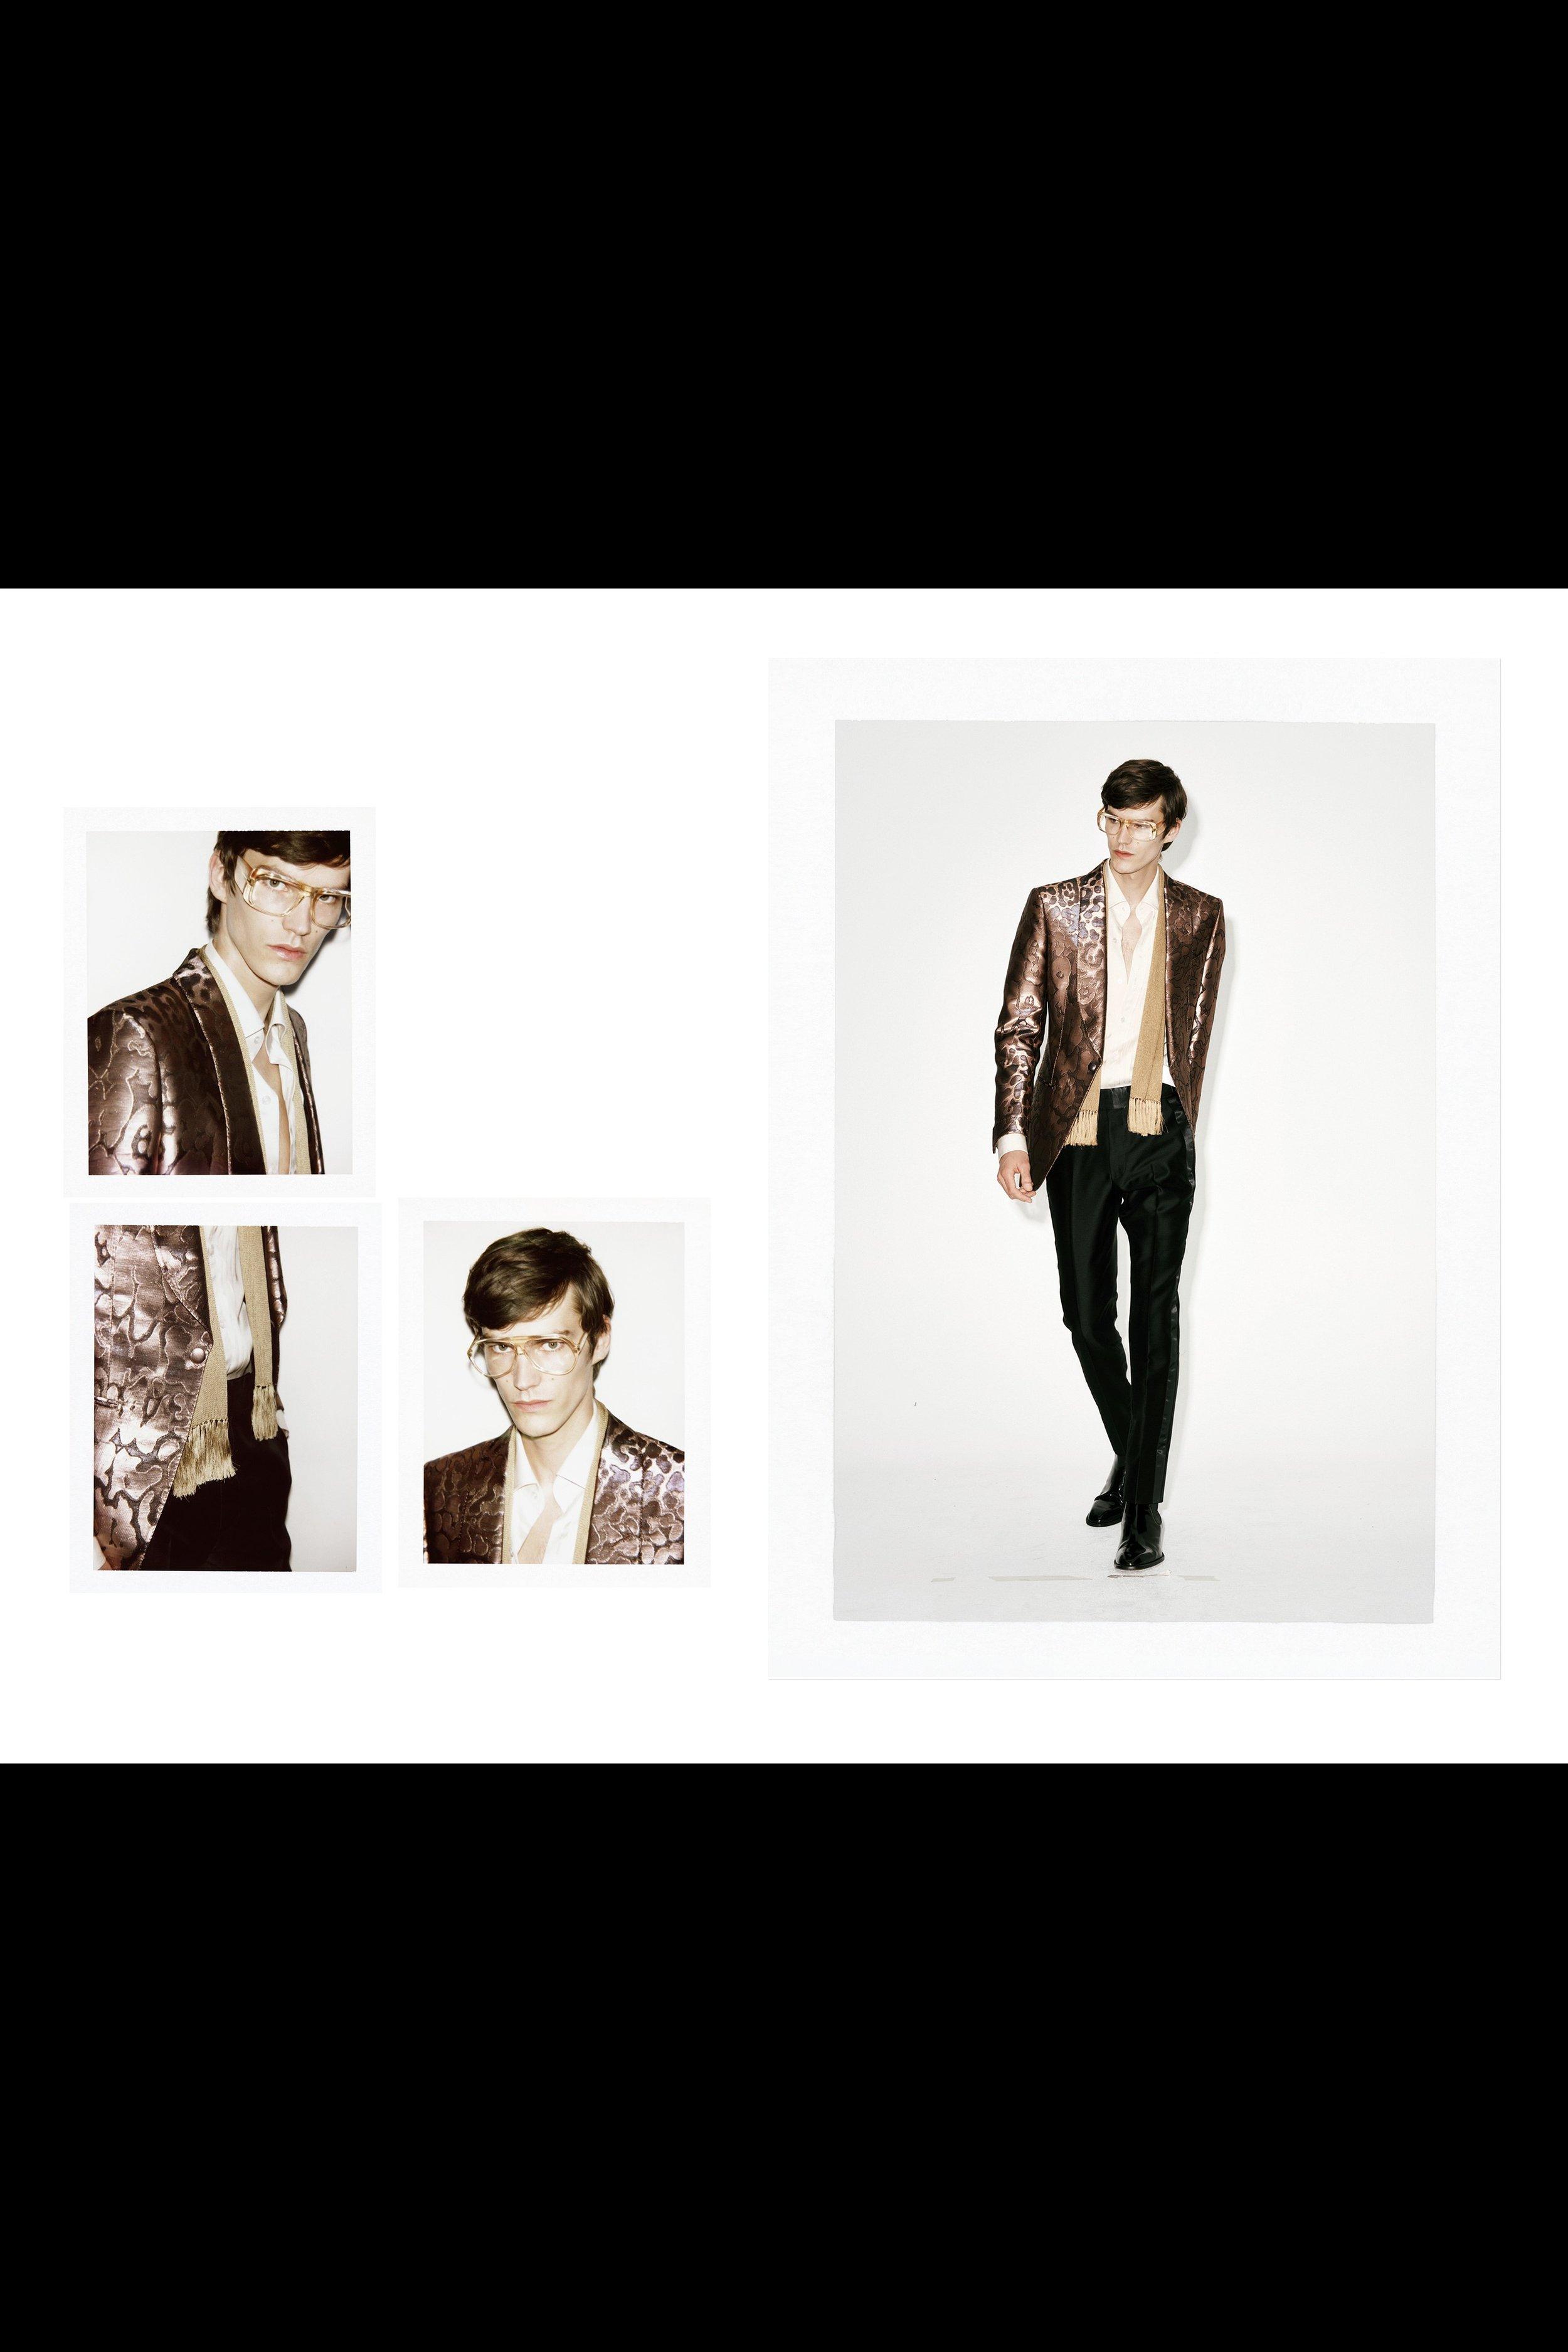 00038-Tom-Ford-vogue-menswear-spring-2019-pr.jpg